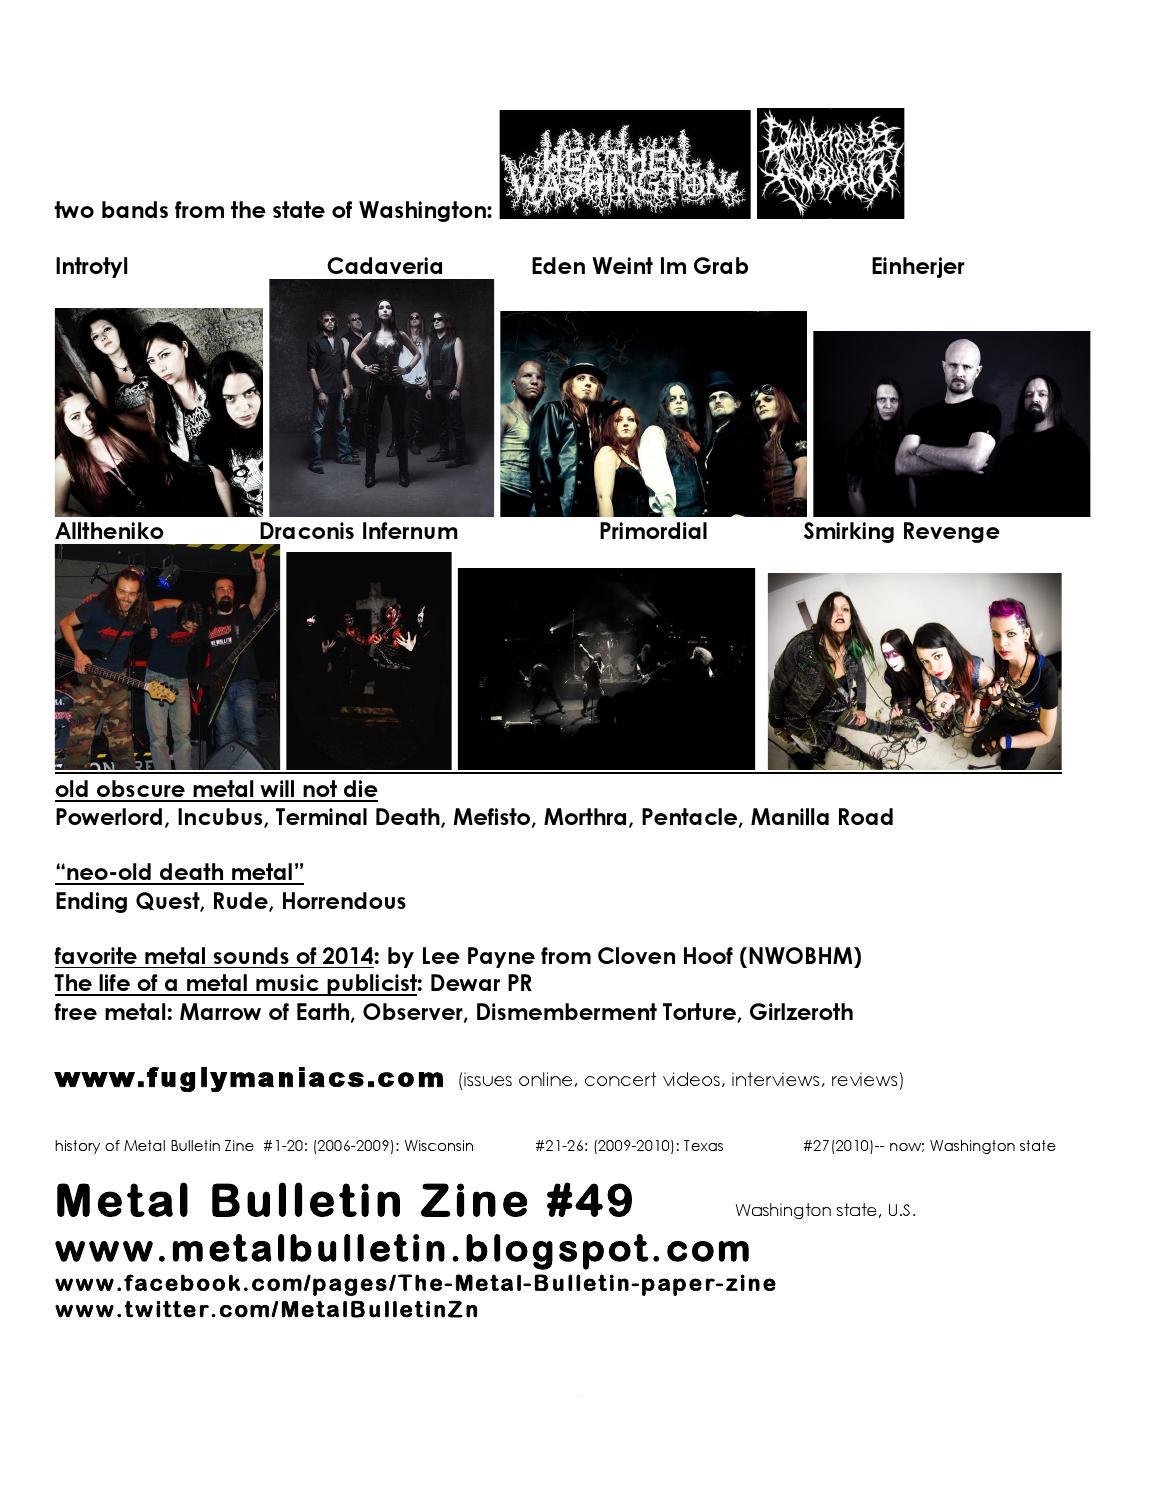 Metal Bulletin Zine 49 by Metal Bulletin Zine - issuu